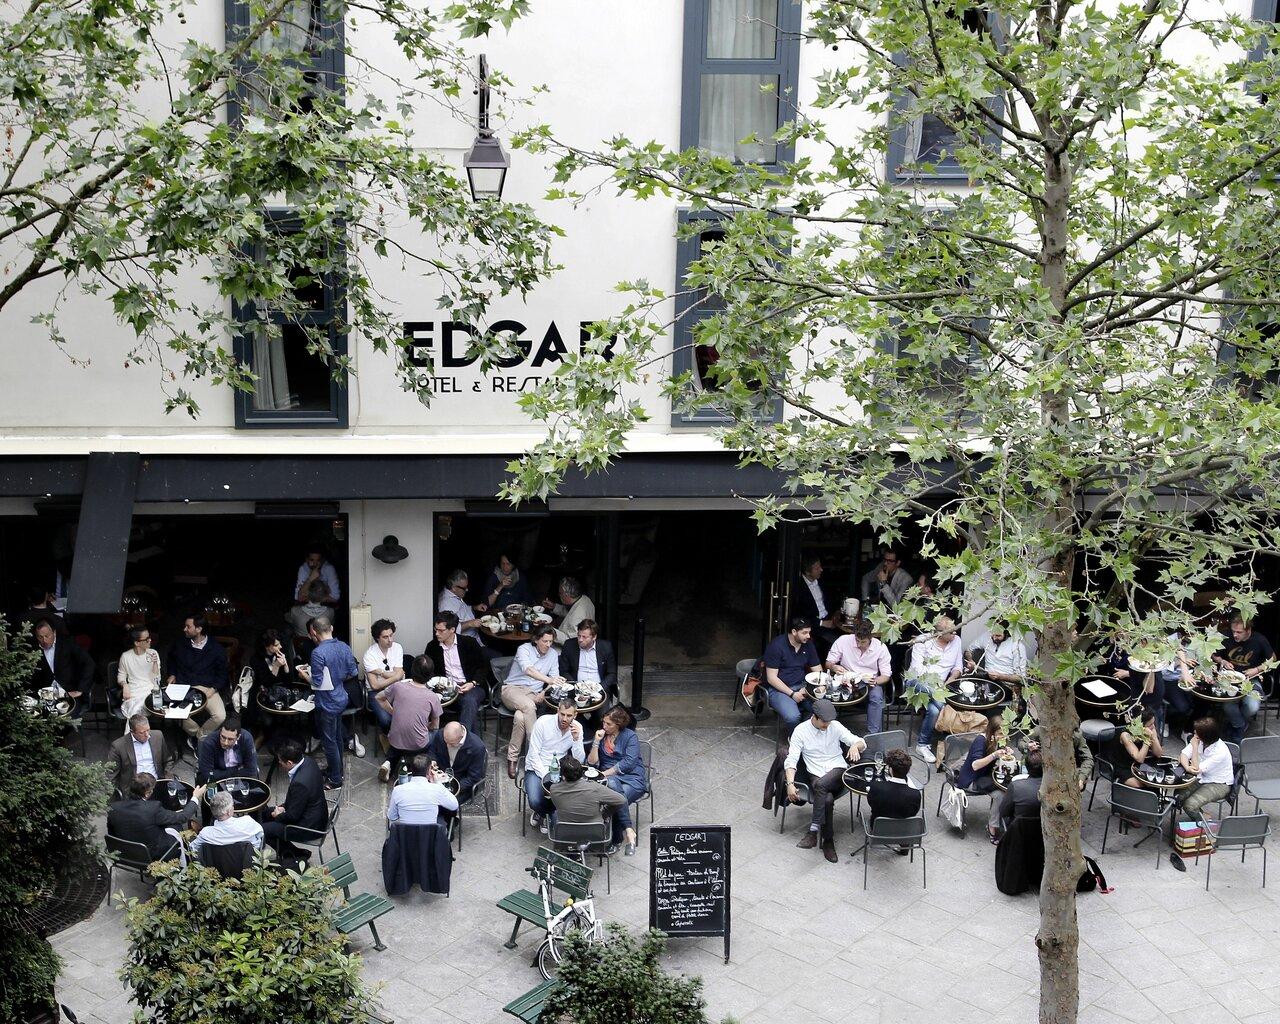 Edgar Restaurant And Hotel